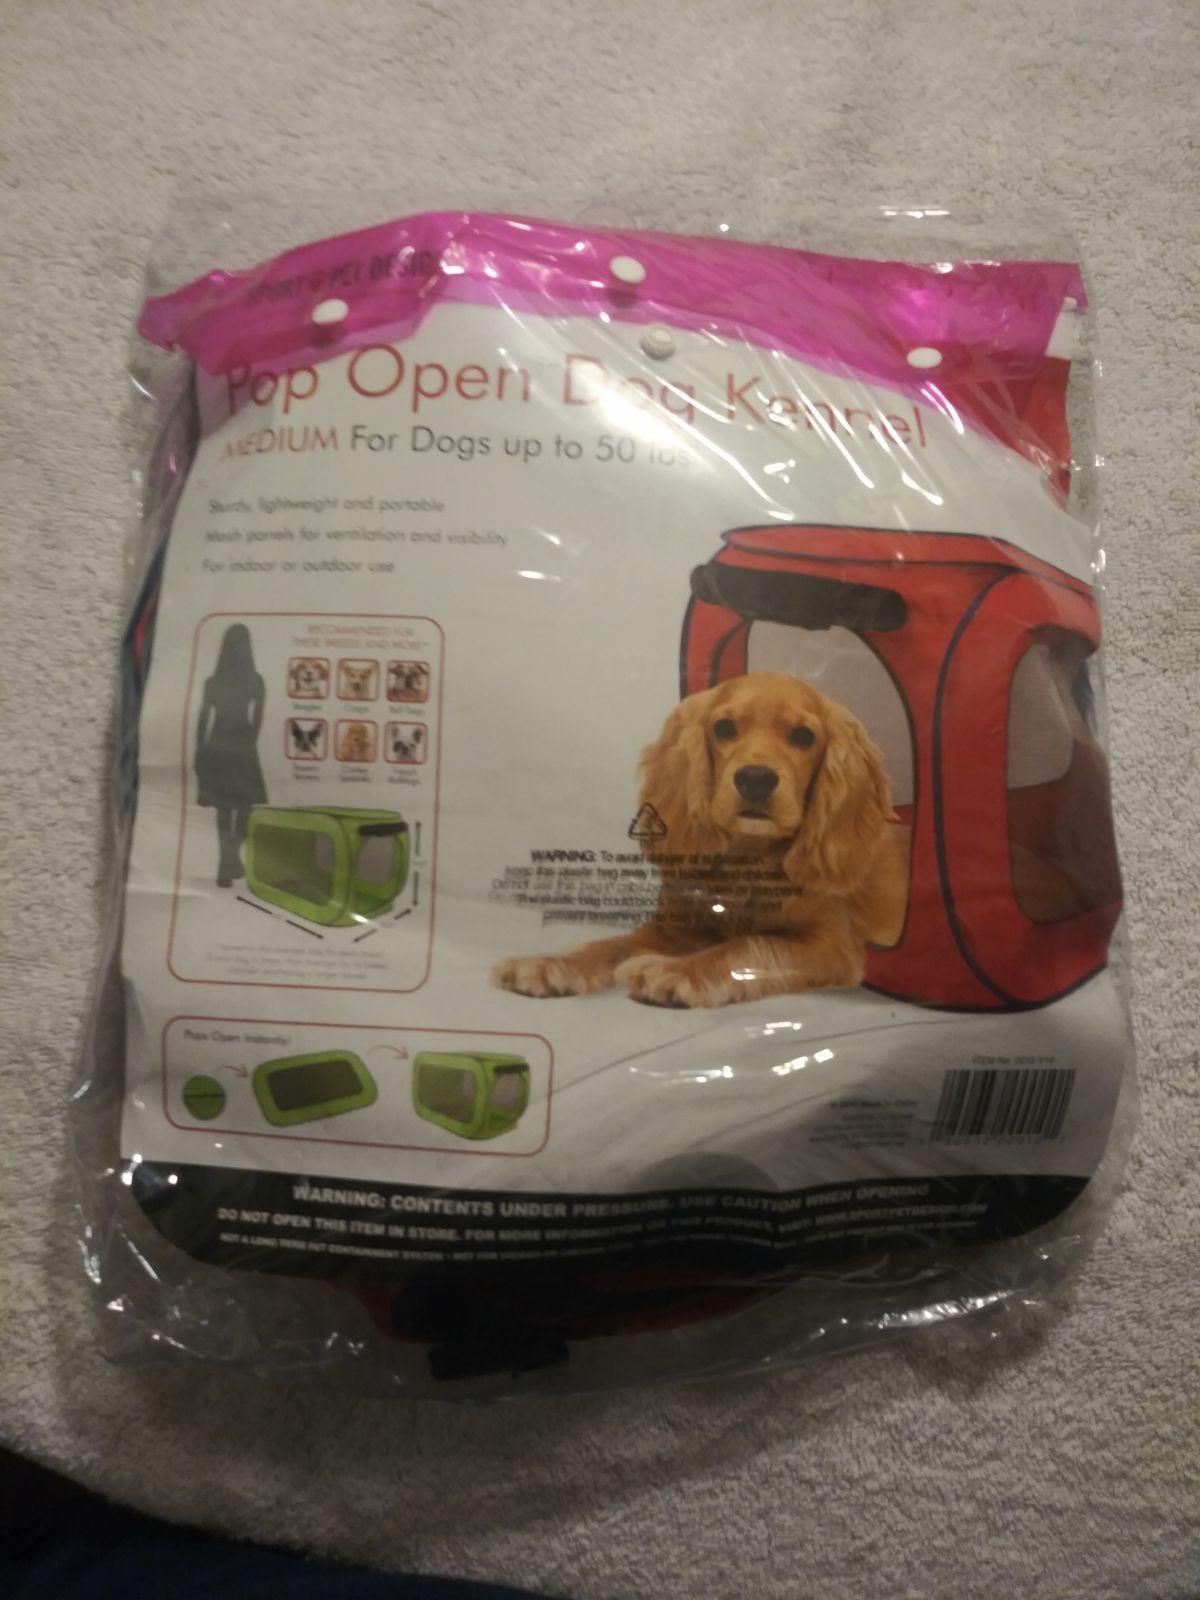 Pop open medium dog kennel